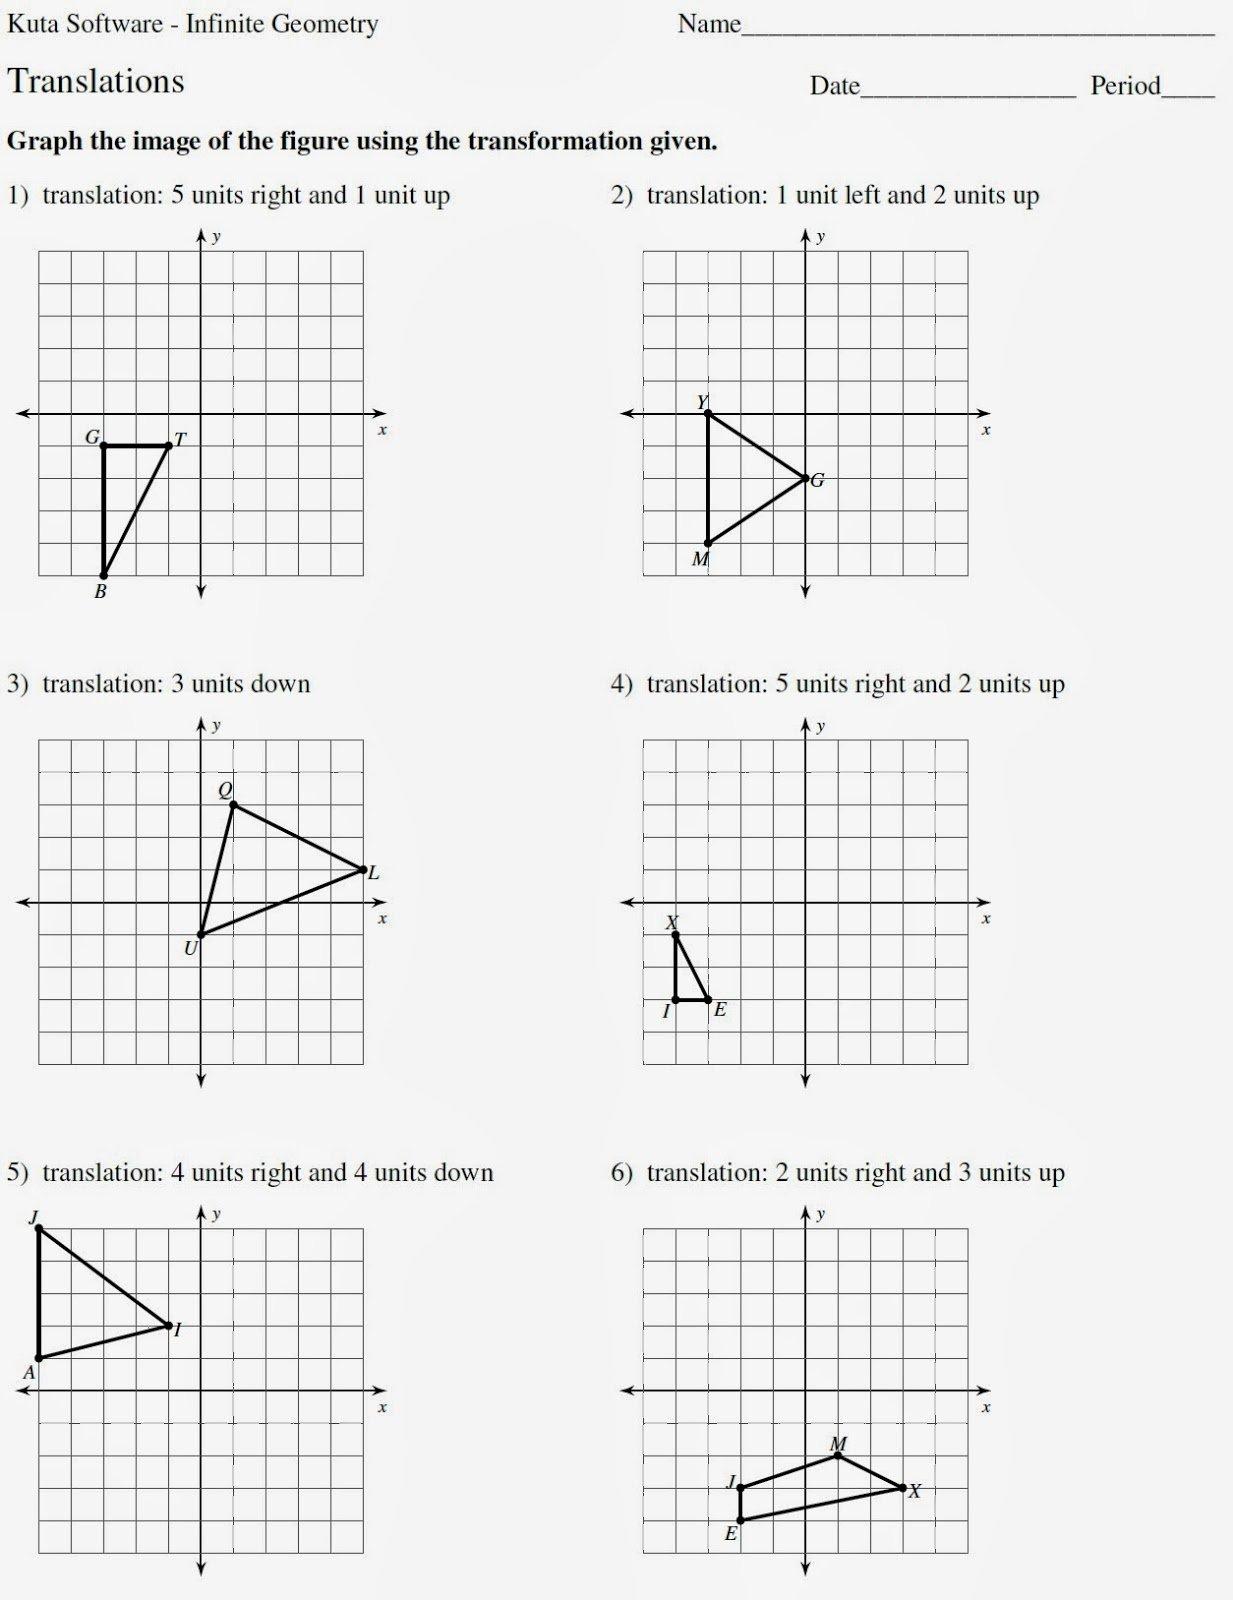 Geometry Transformations Worksheet Pdf Best Of Mr Matt S Math Classes assignment Translations